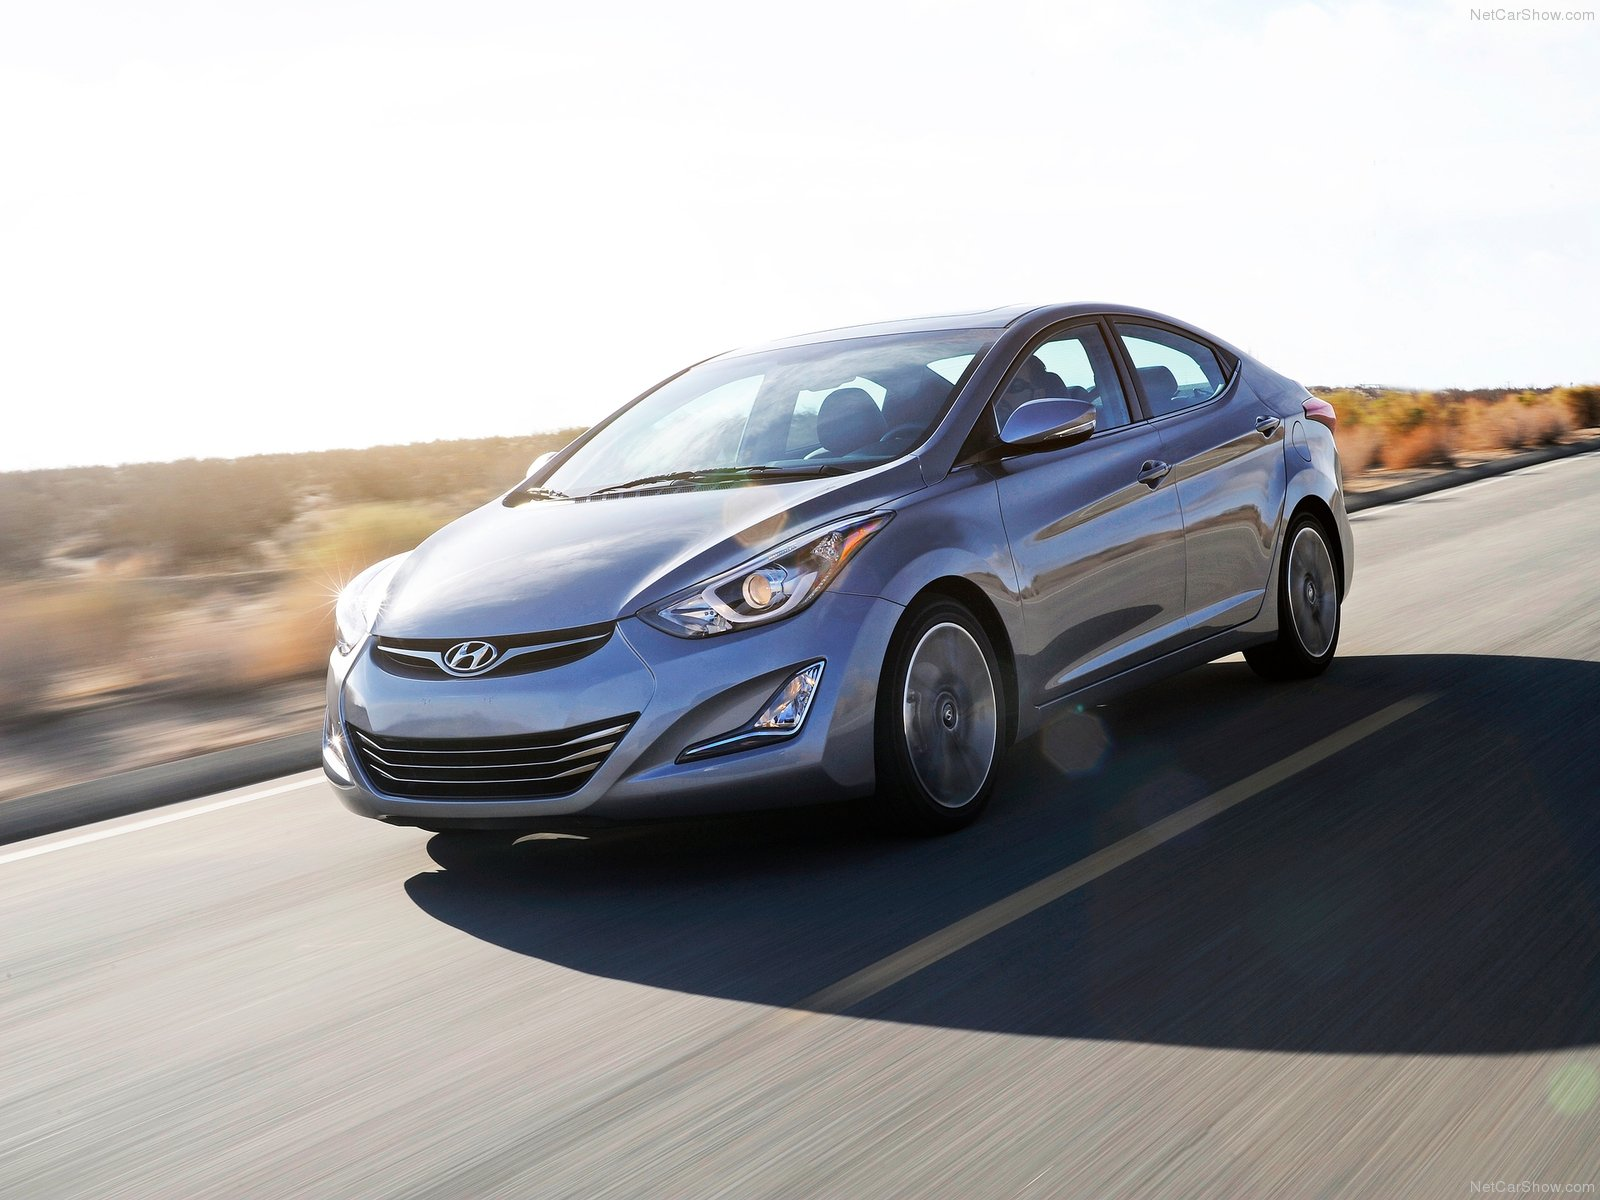 1 миллион миль на Hyundai Elantra.